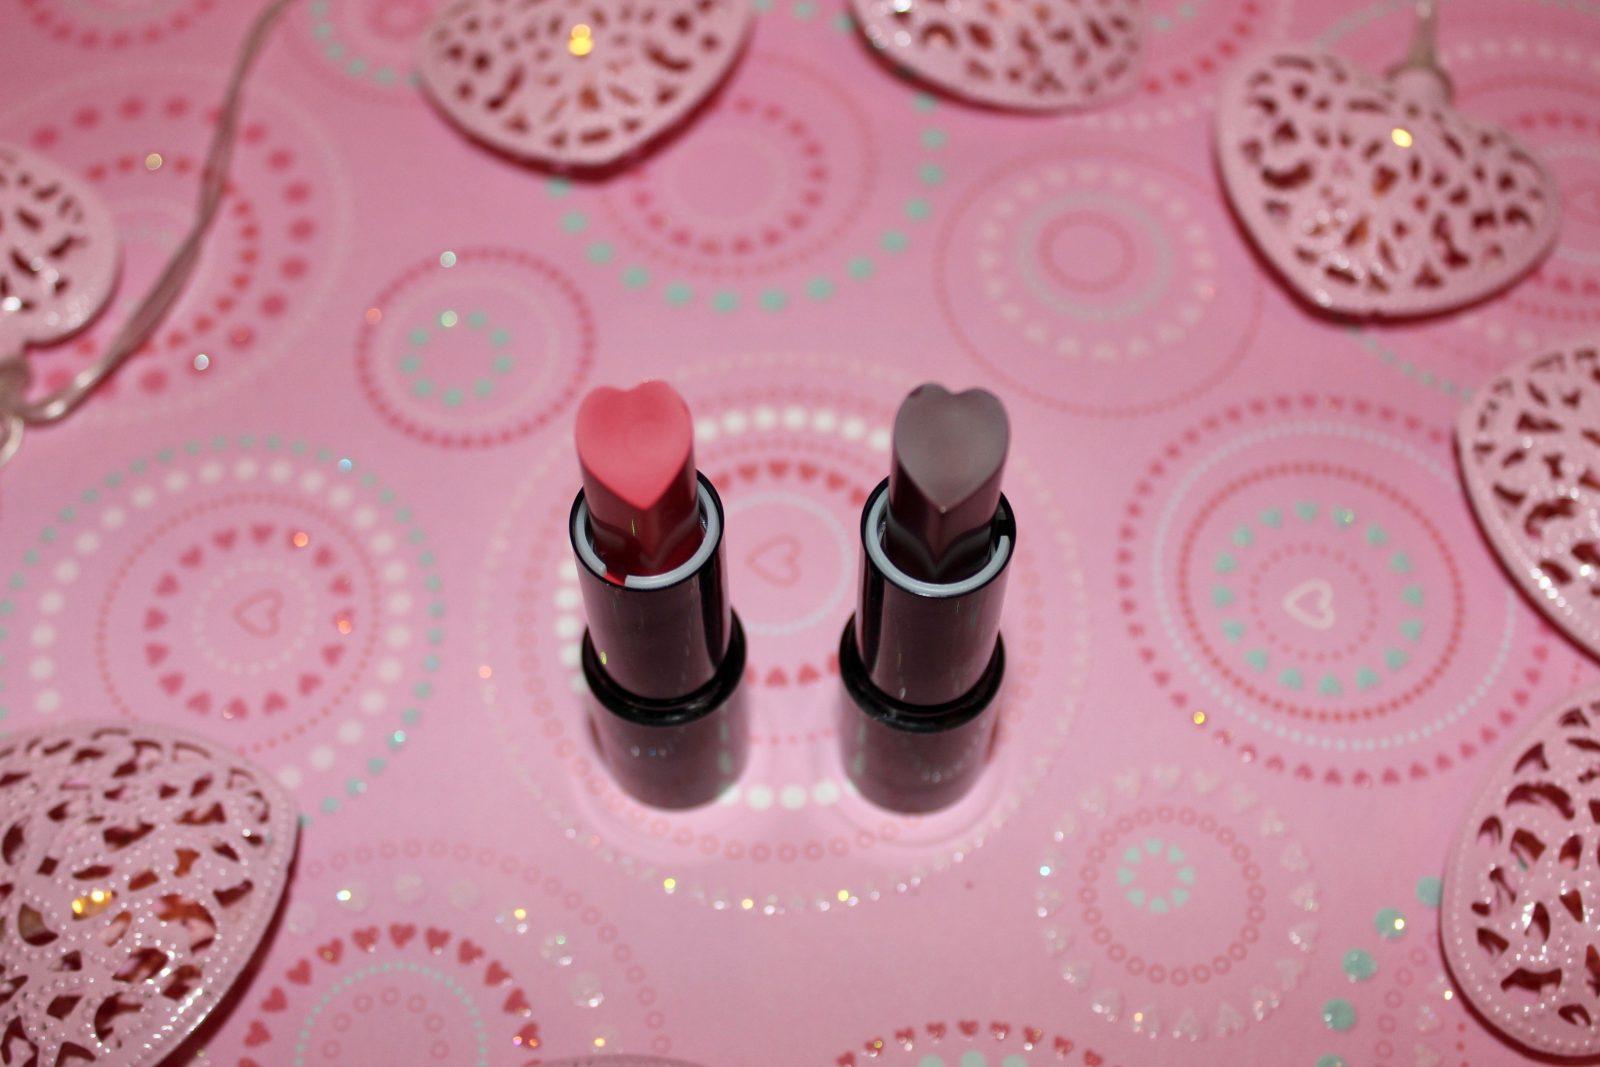 essence cosmetics ireland